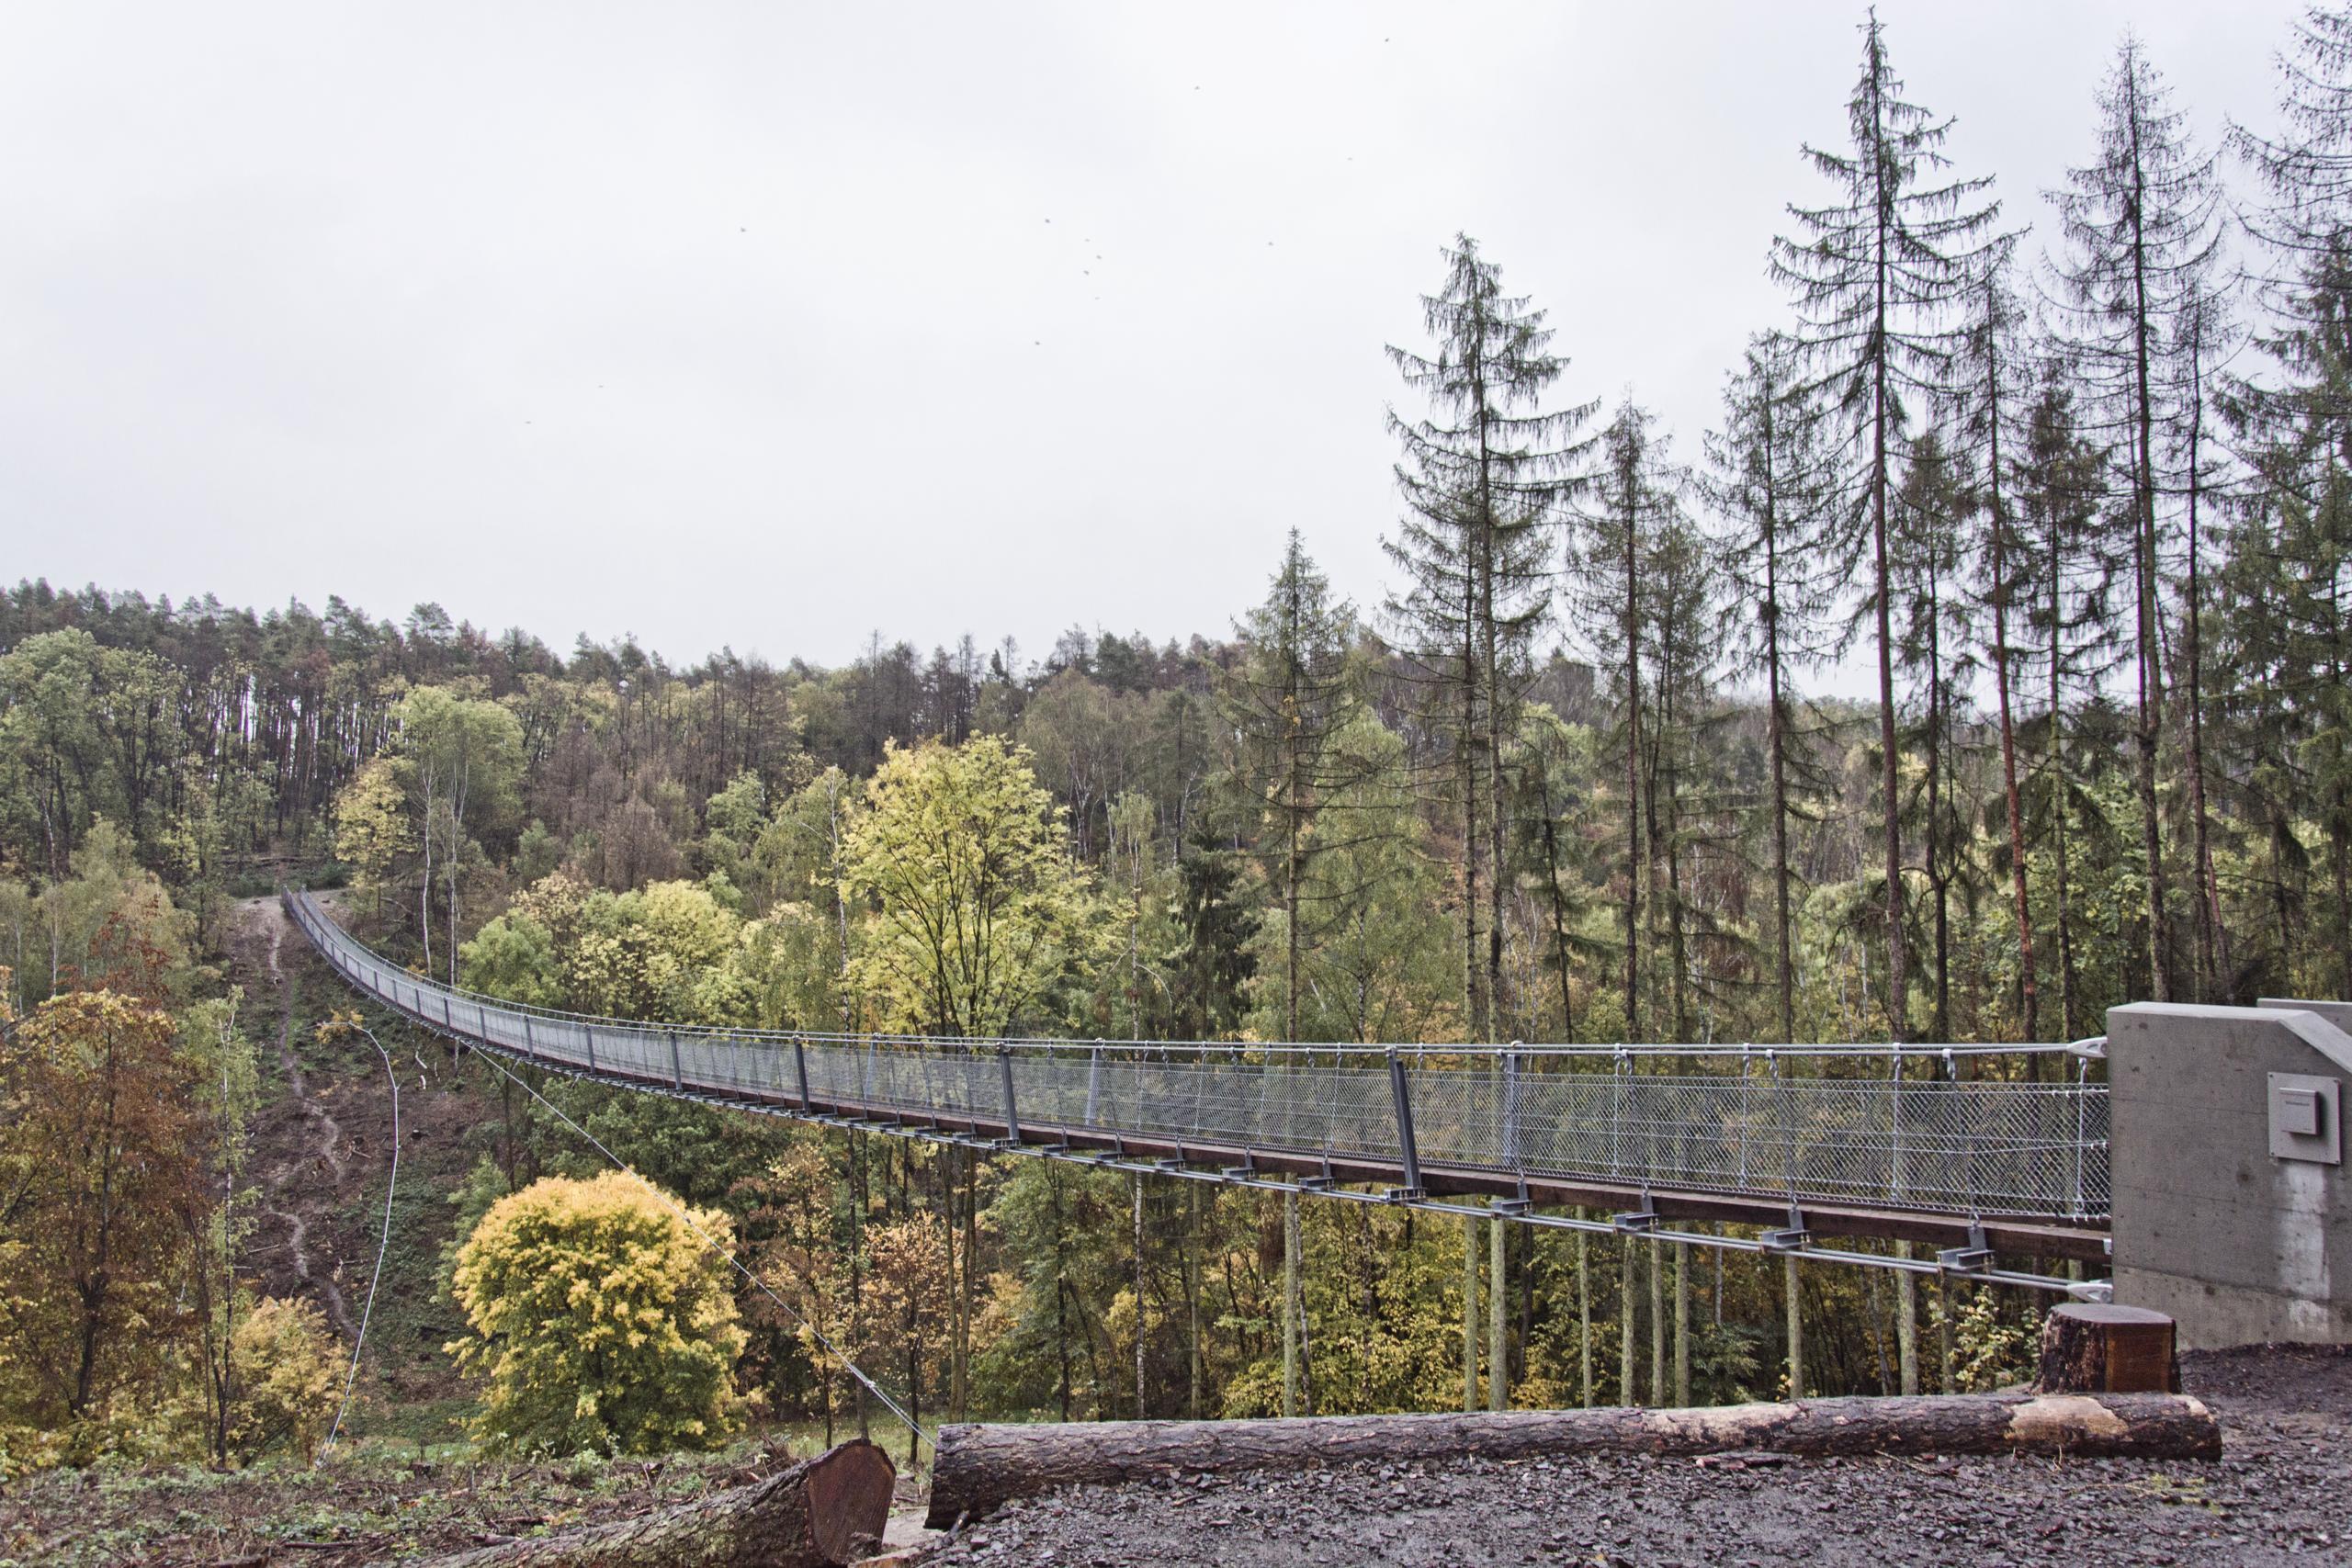 Hängeseilbrücke Bärental / Hohe Schrecke